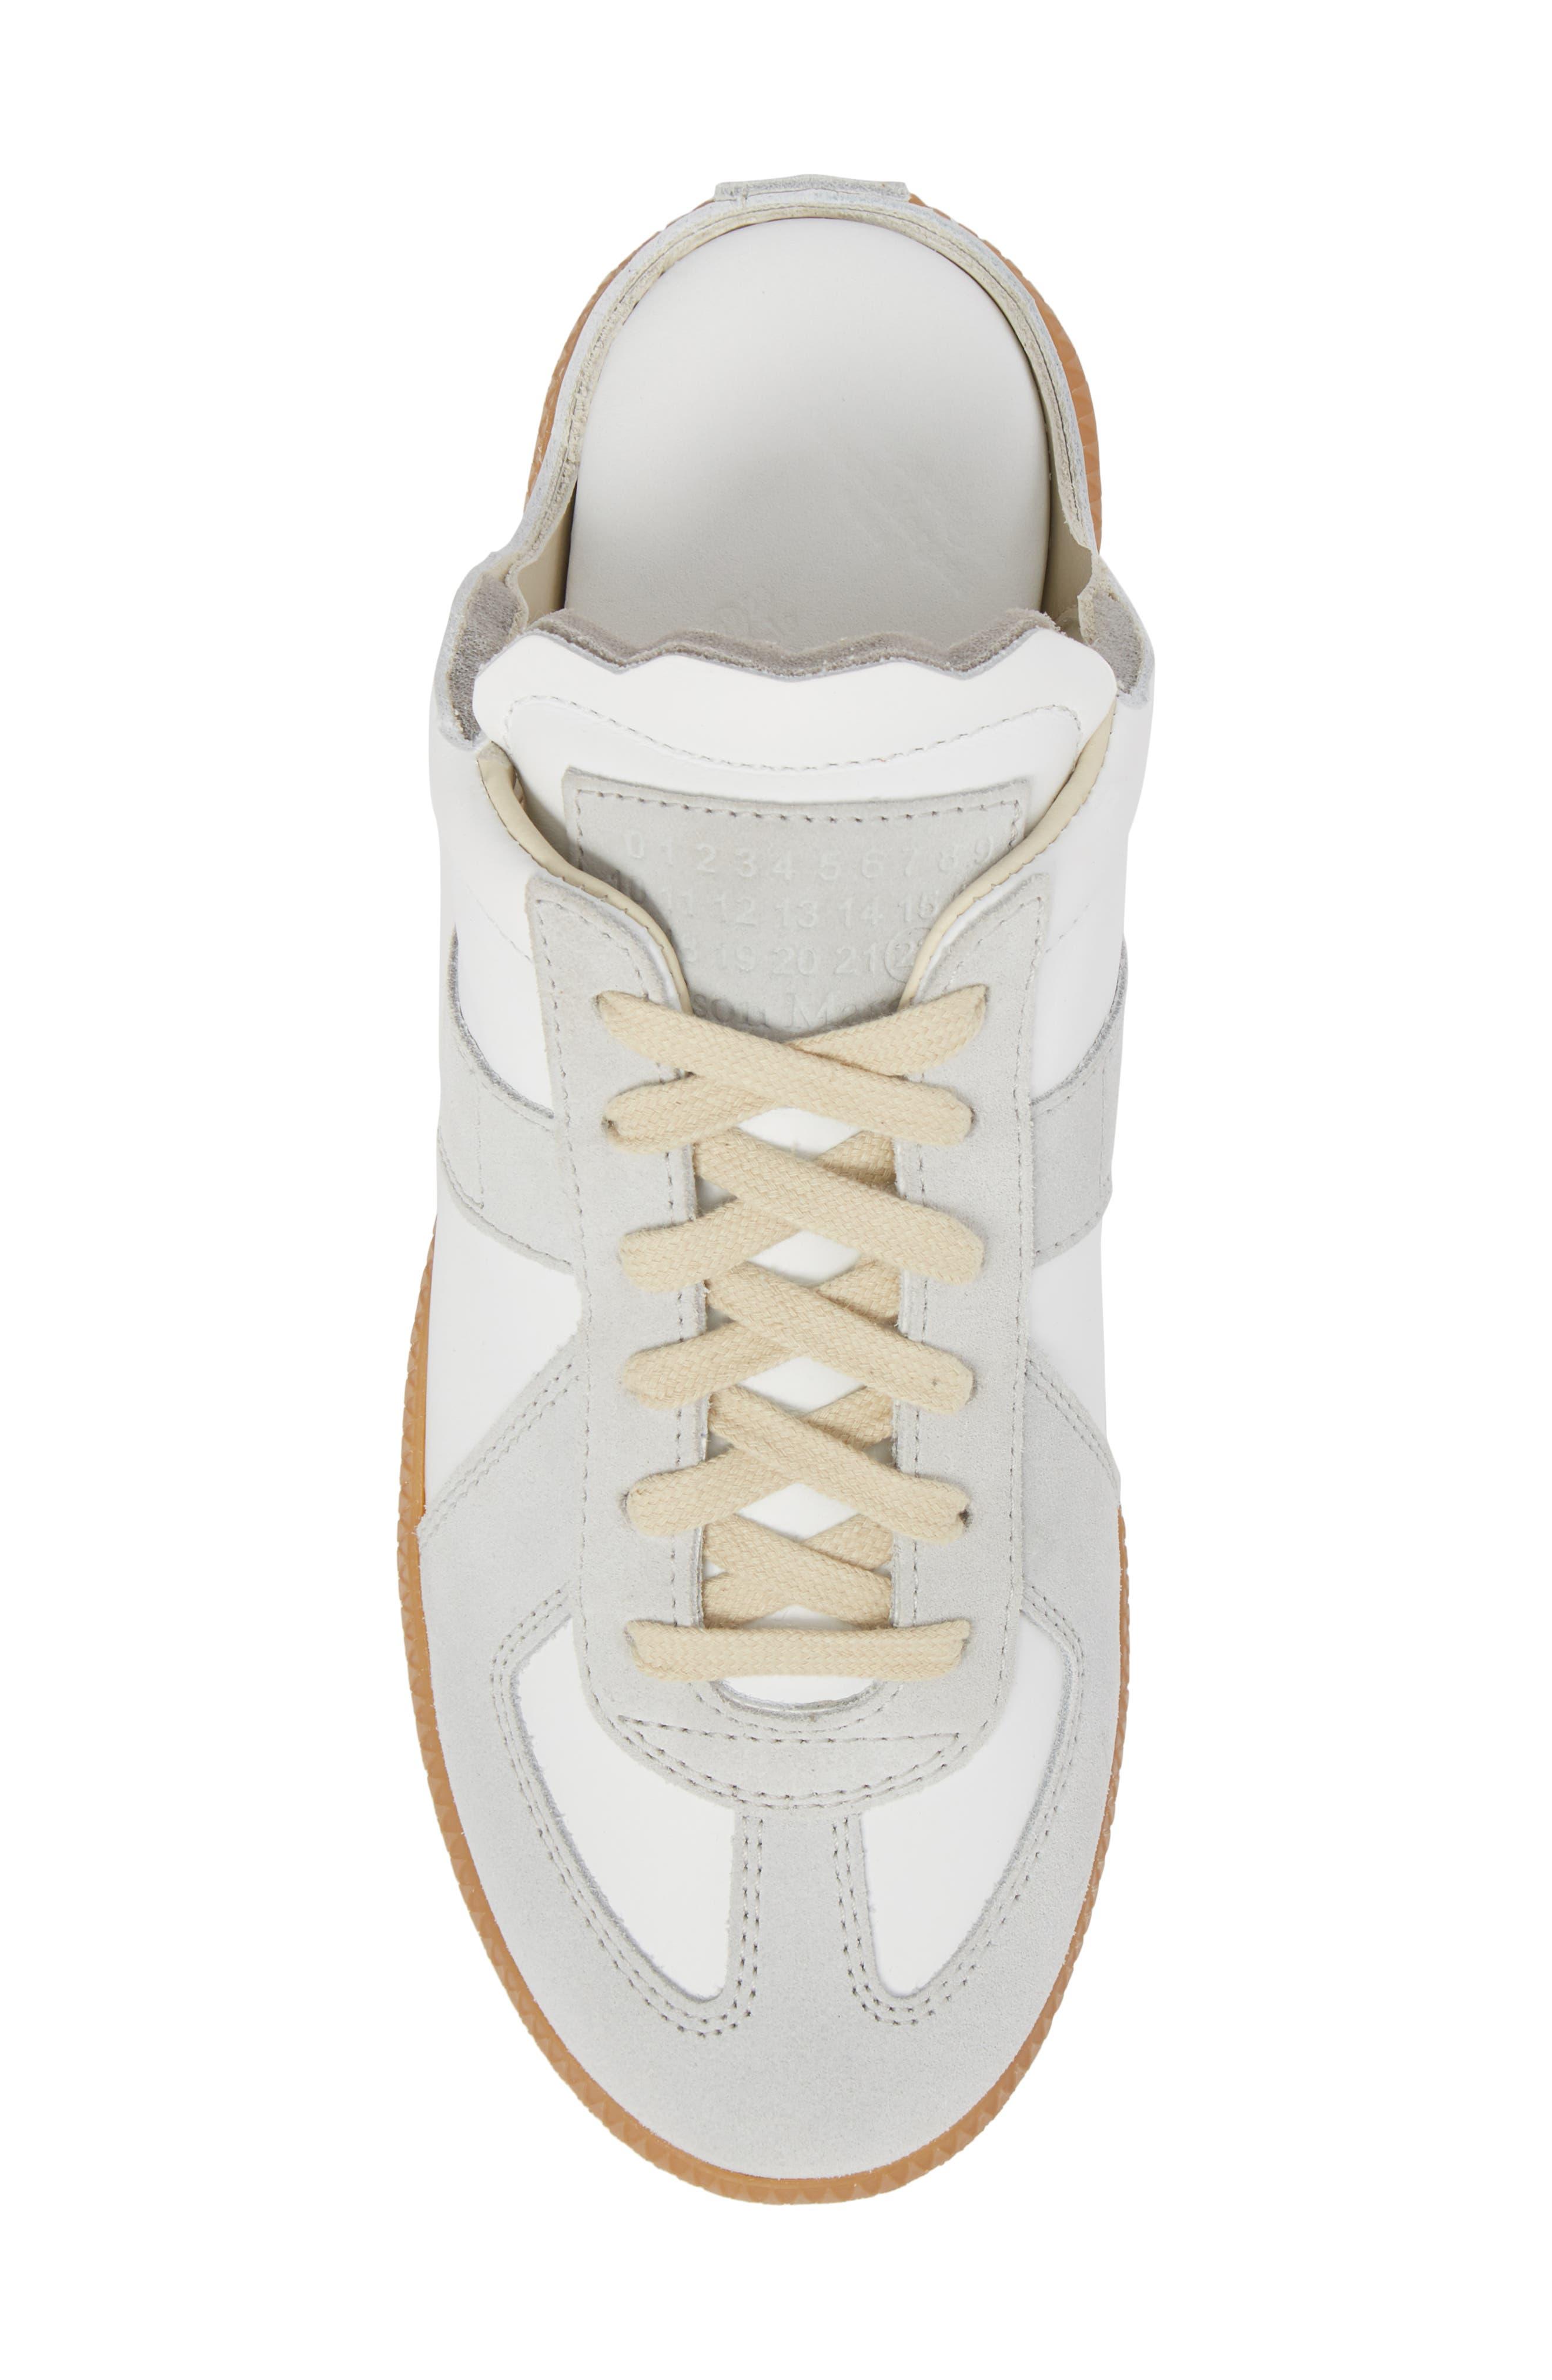 Replica Sneaker Mule,                             Alternate thumbnail 5, color,                             Amber/ White